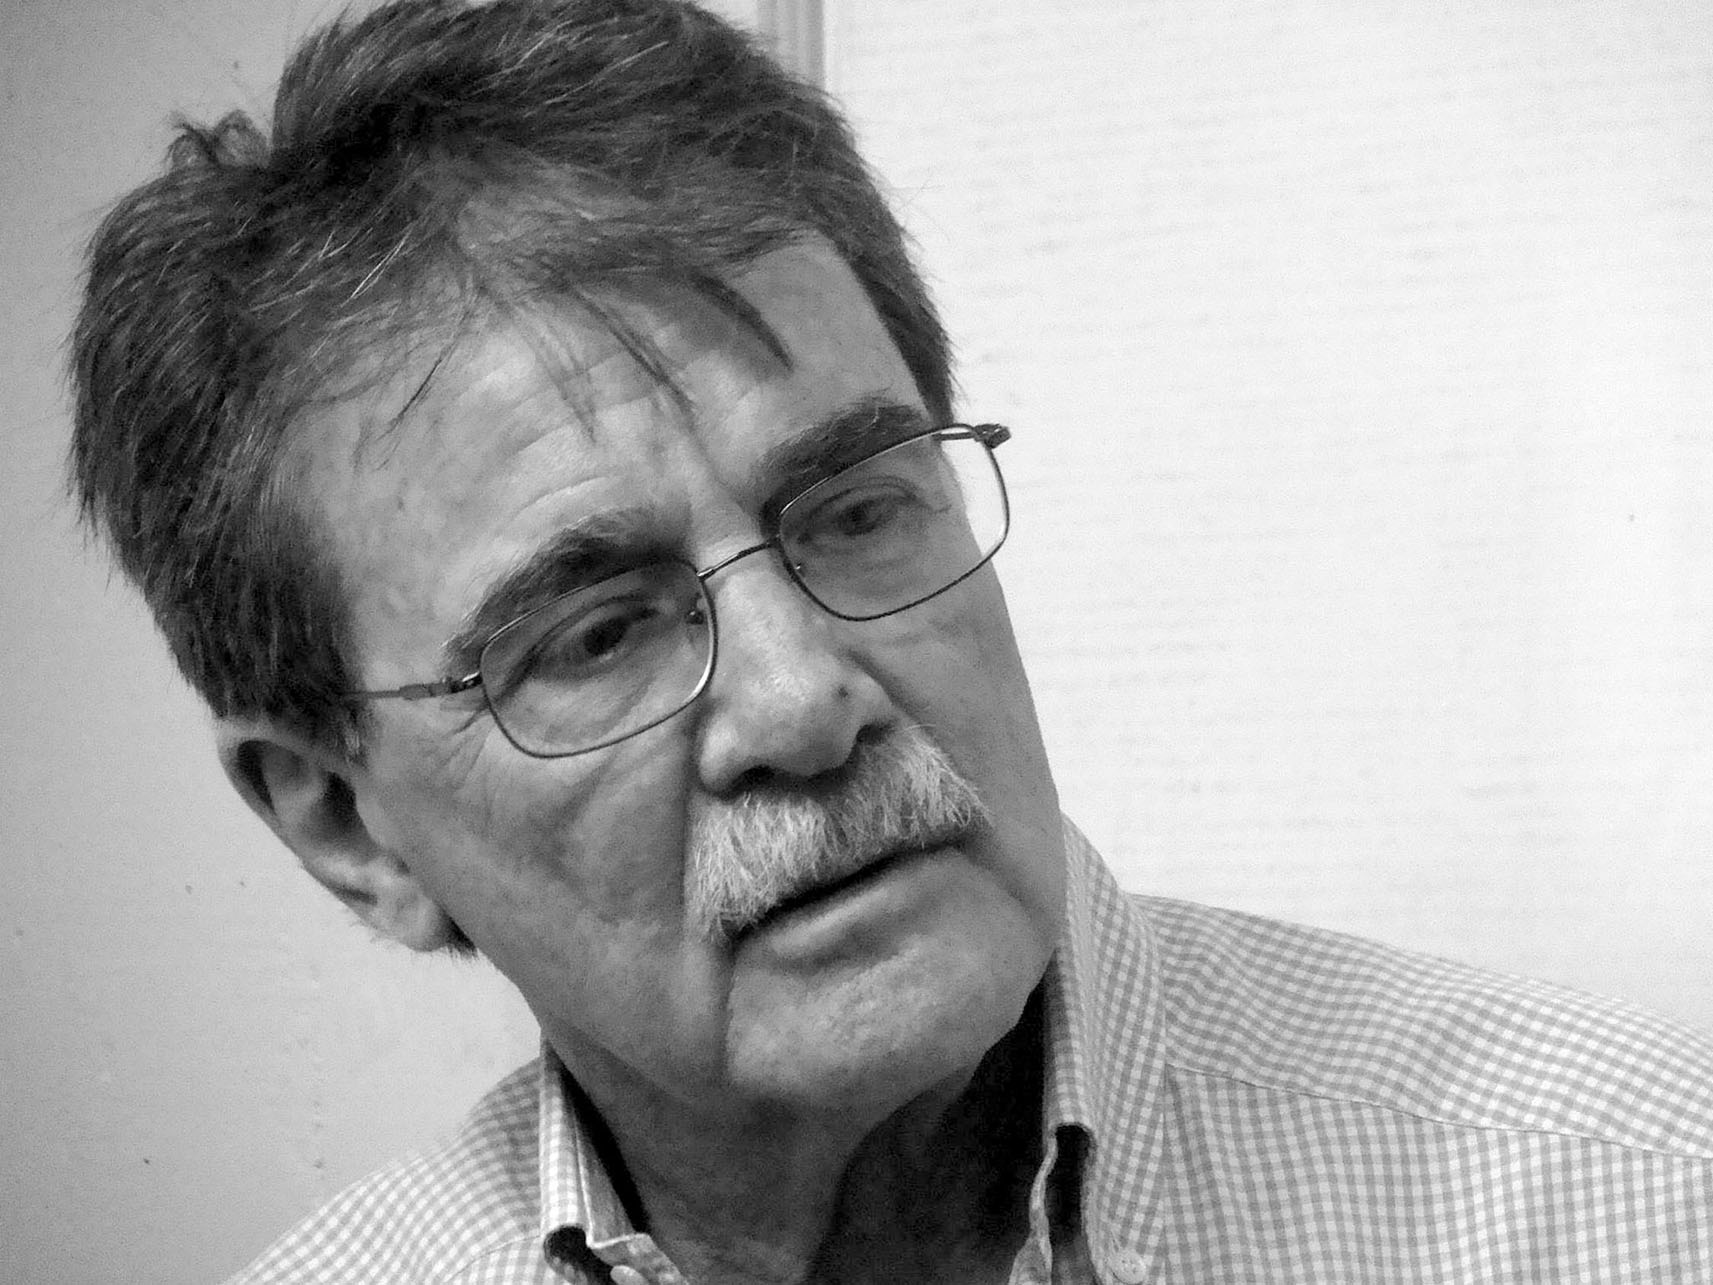 A portrait of Teodoro Petkoff in 2010. (Photo by Luís Carlos Díaz.)